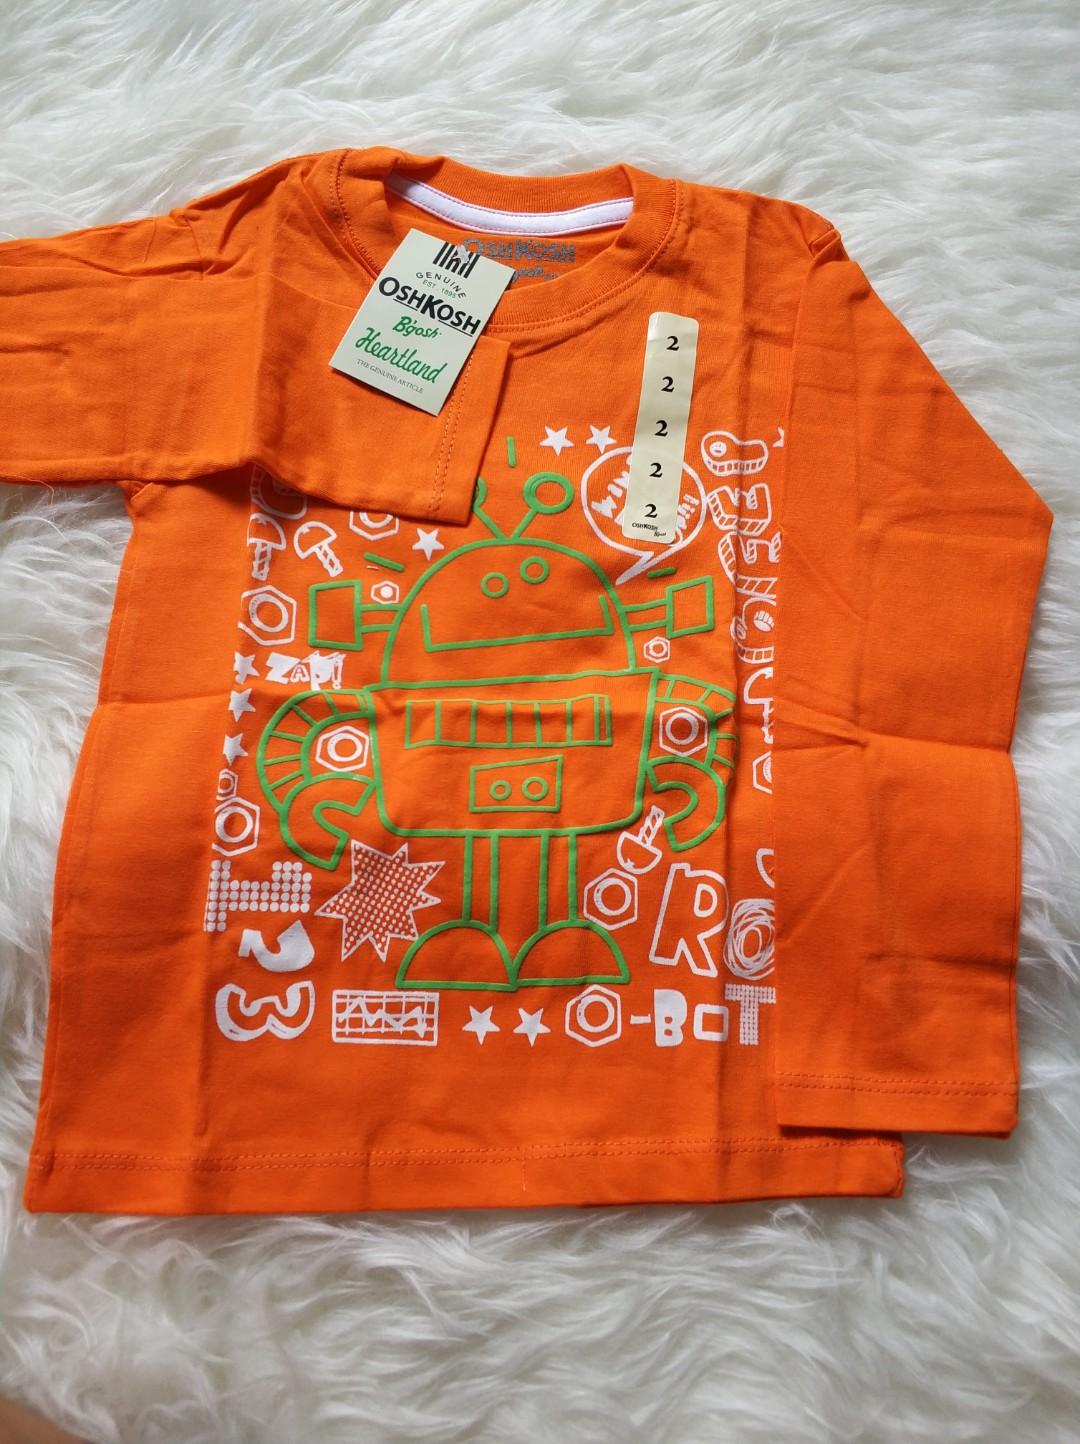 Baju Baru Habisin Stok Anak Oskosh Premium Size 2t Ld30 P40 Baruuu Kemeja Slimfit Photo